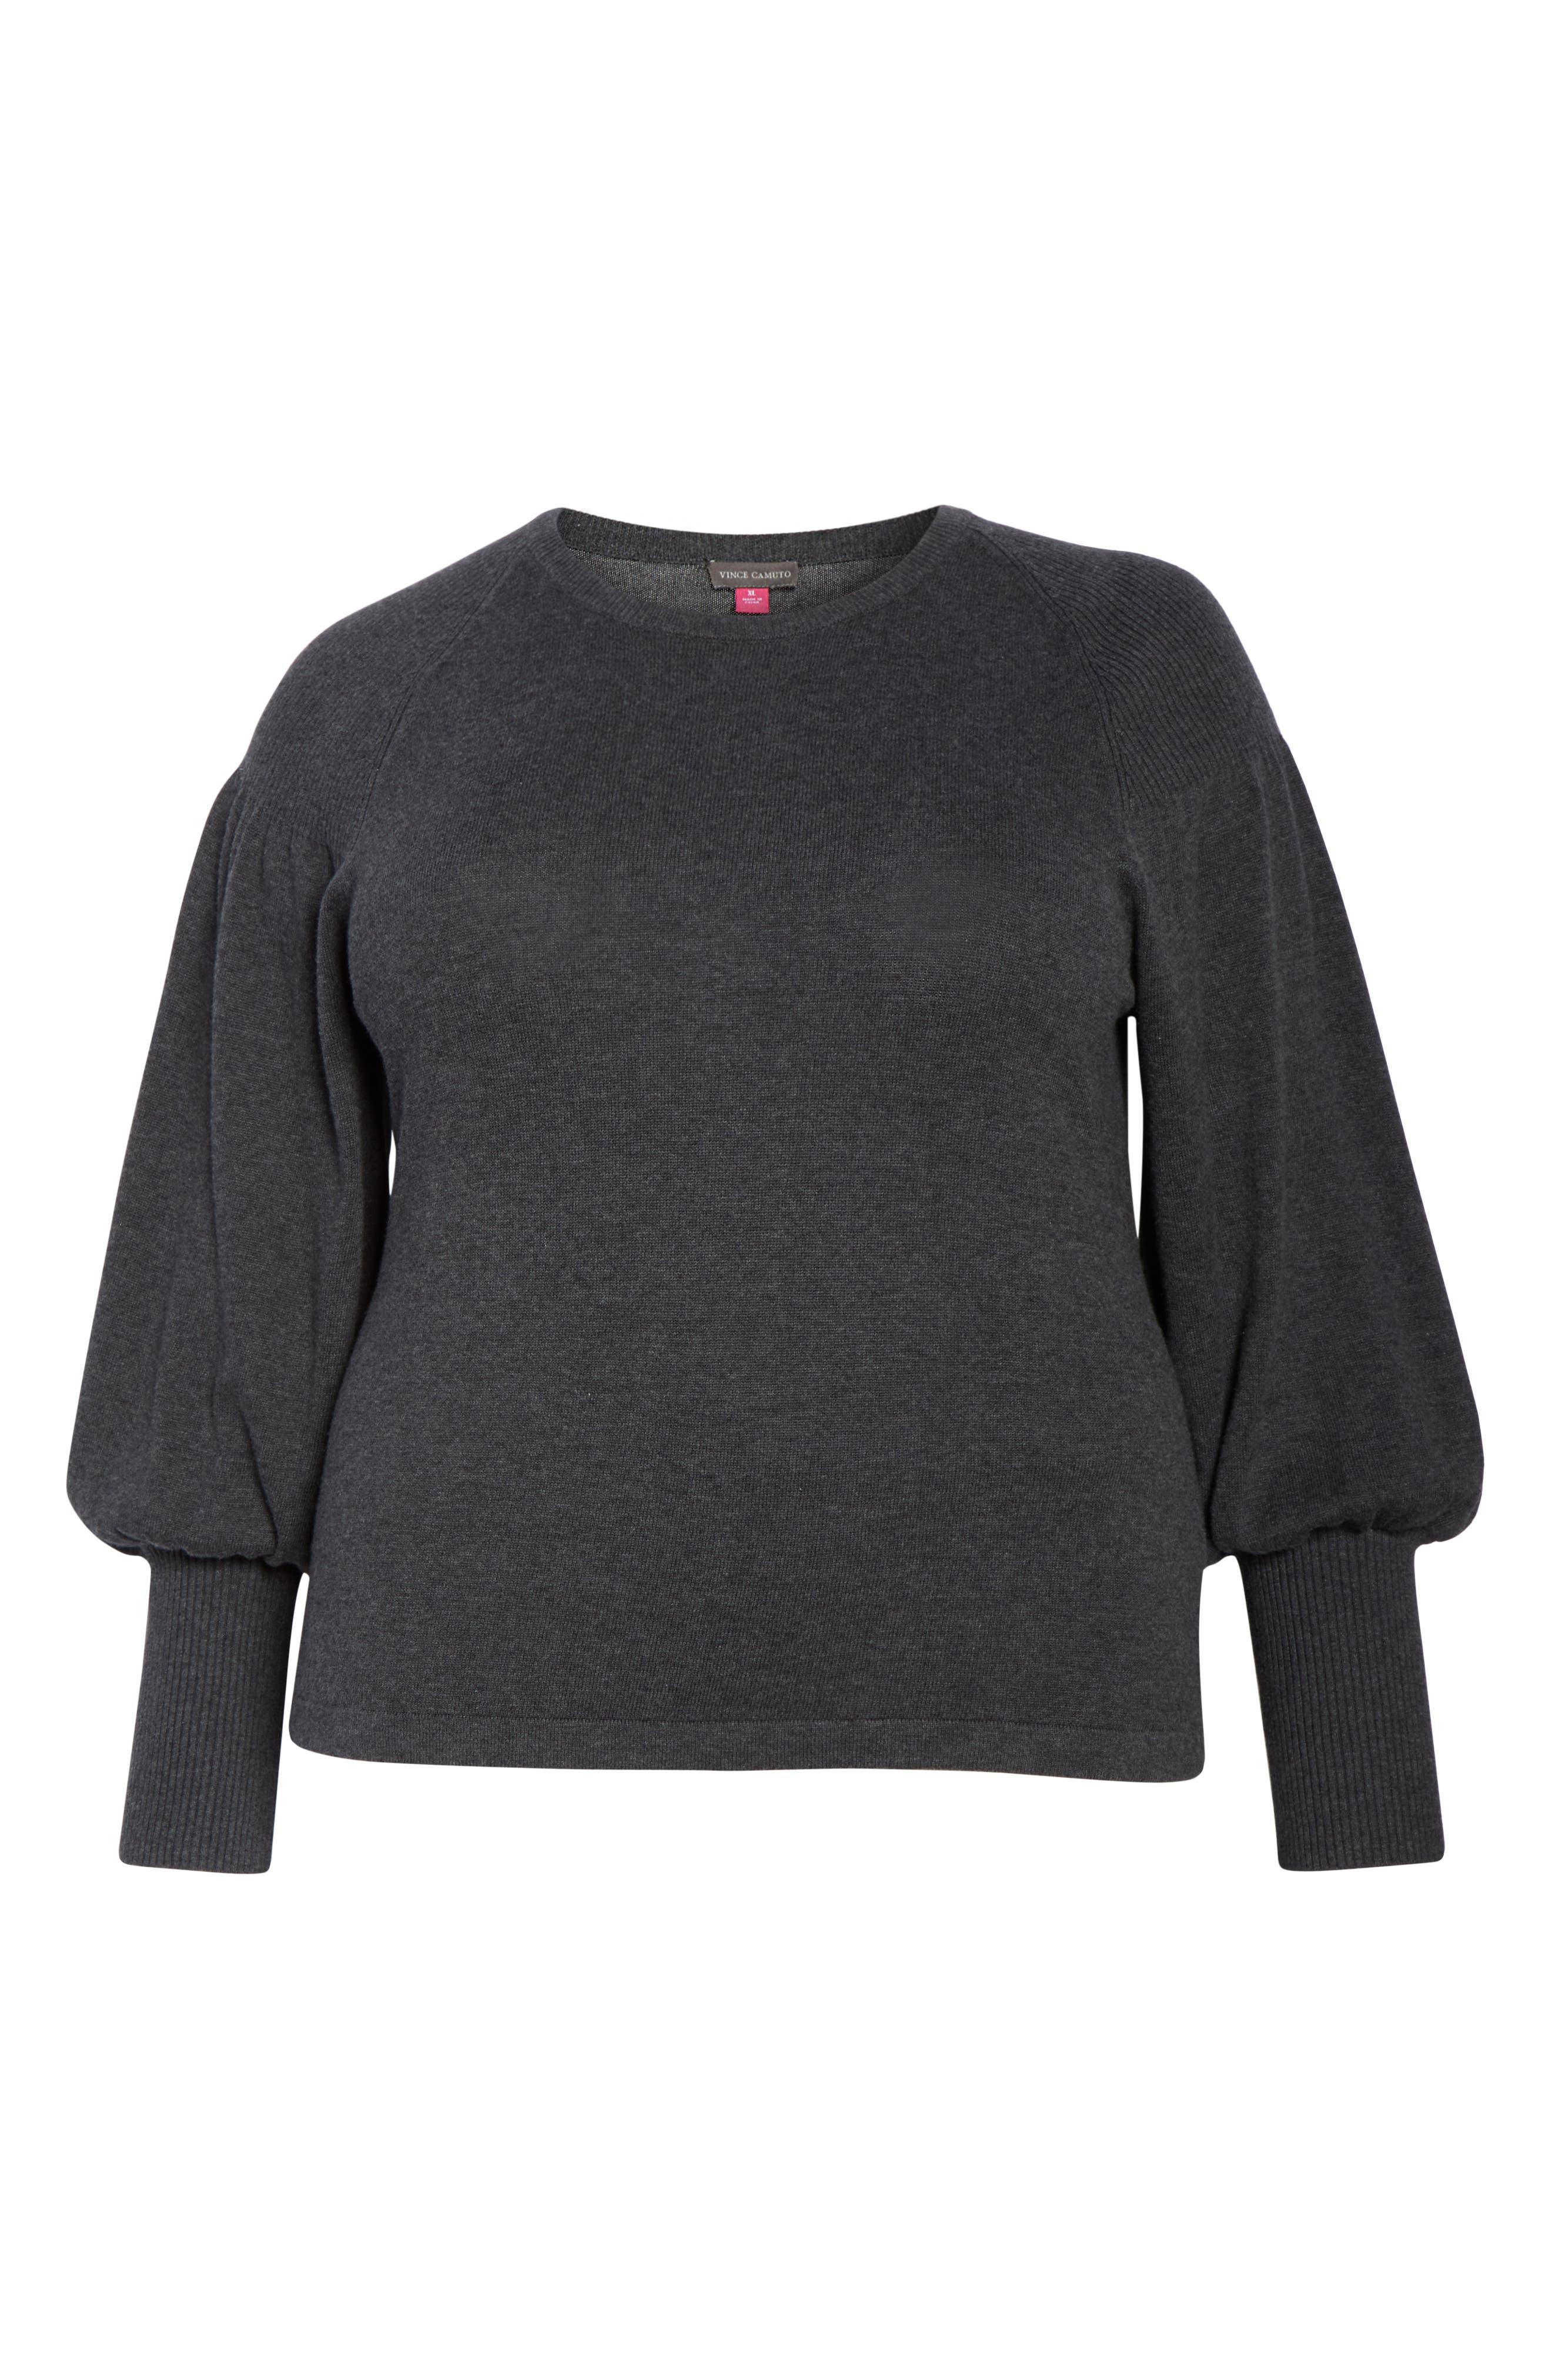 Blouson Sleeve Sweater,                             Alternate thumbnail 8, color,                             MED HEATHER GREY